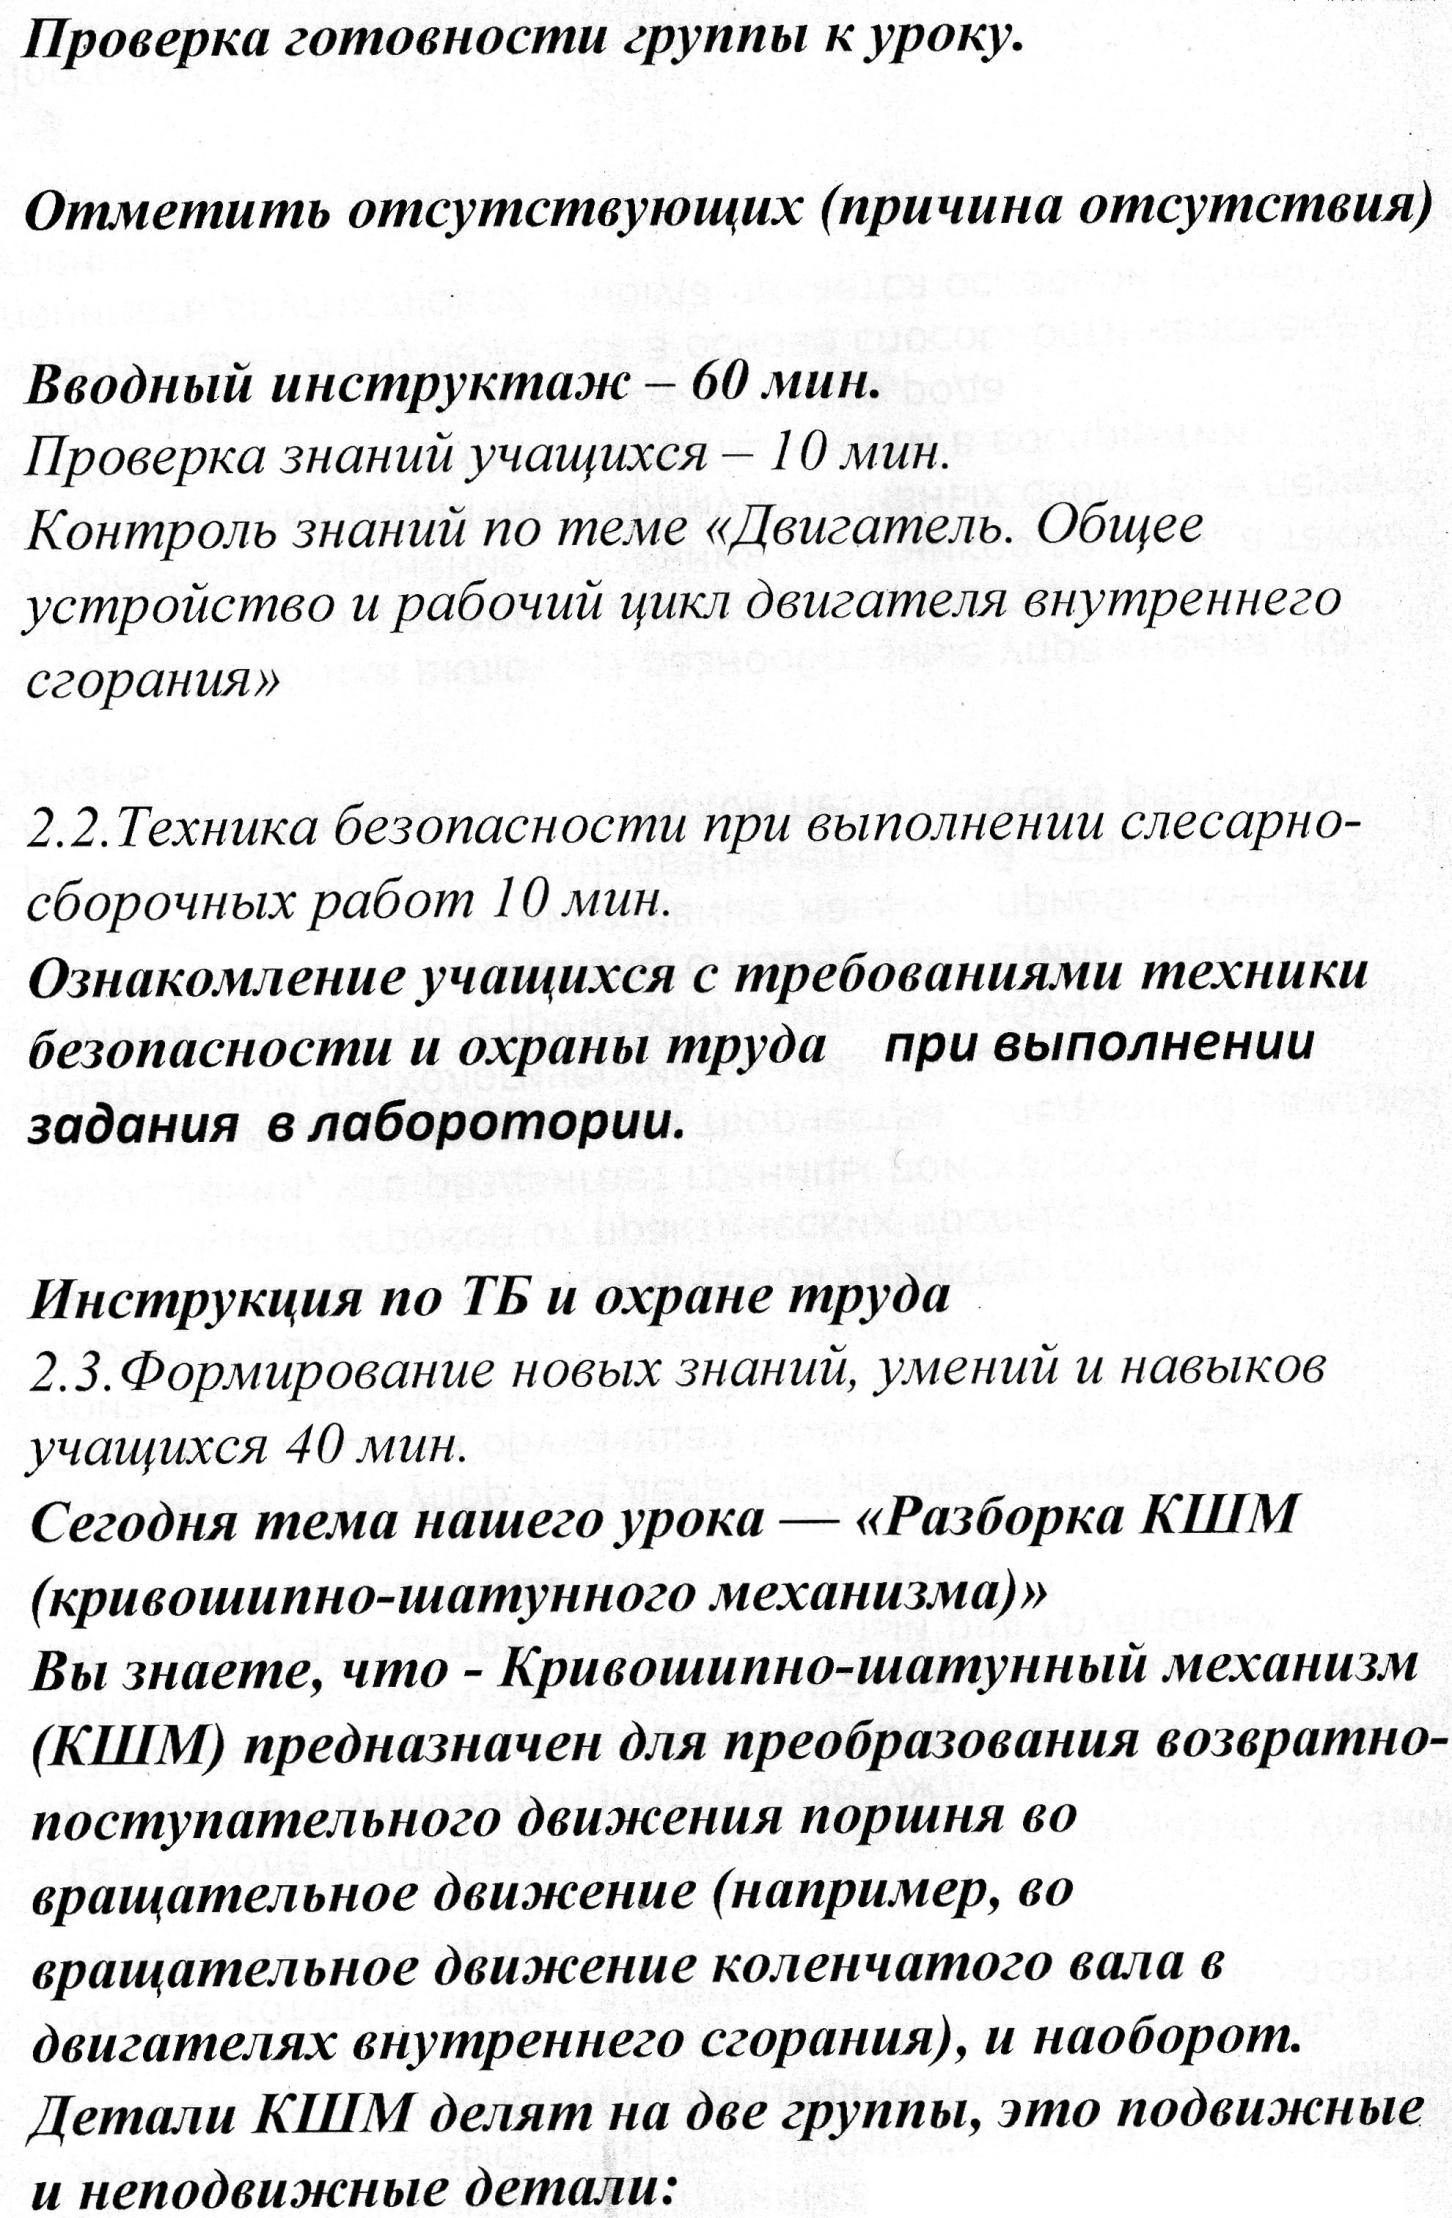 C:\Users\Василий Мельченко\Pictures\img579.jpg